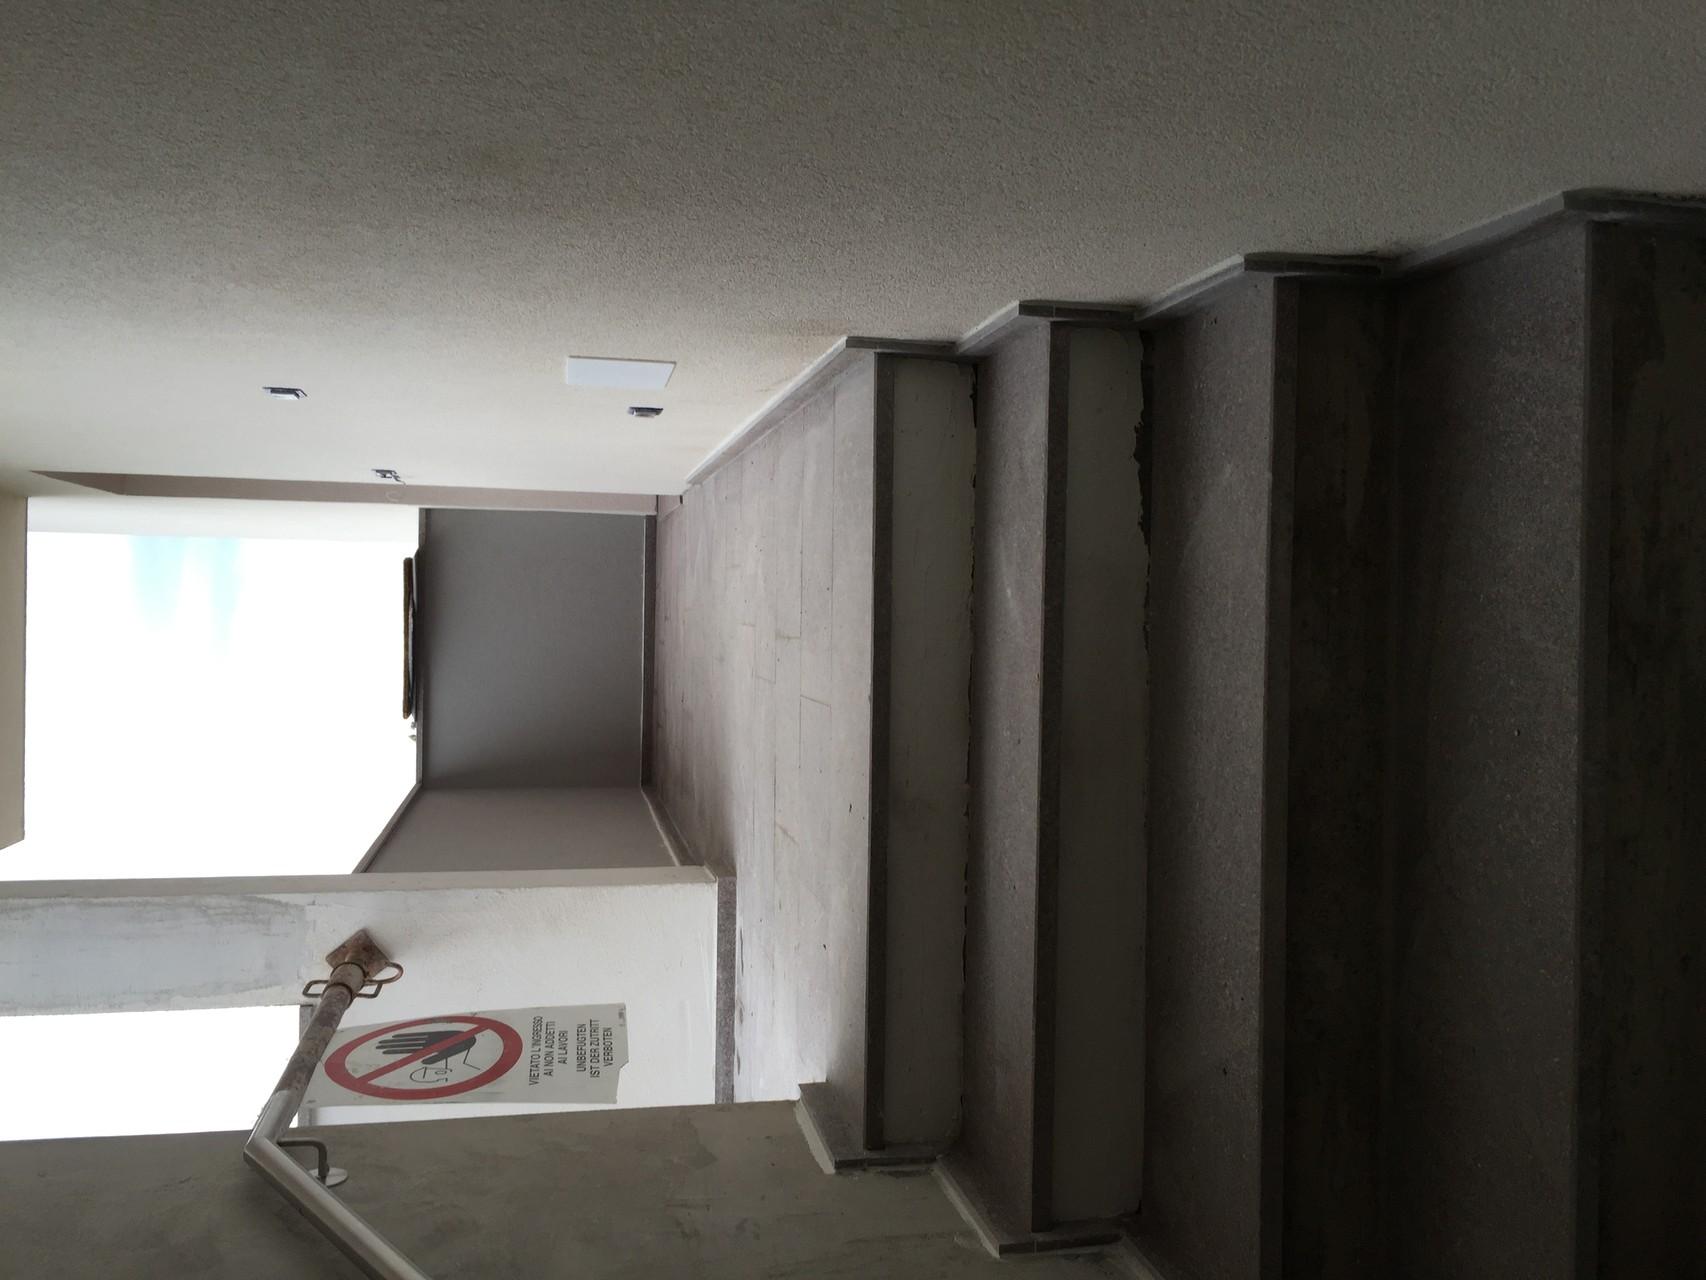 Gerbau   costruzioni   impresa edile   Bolzano